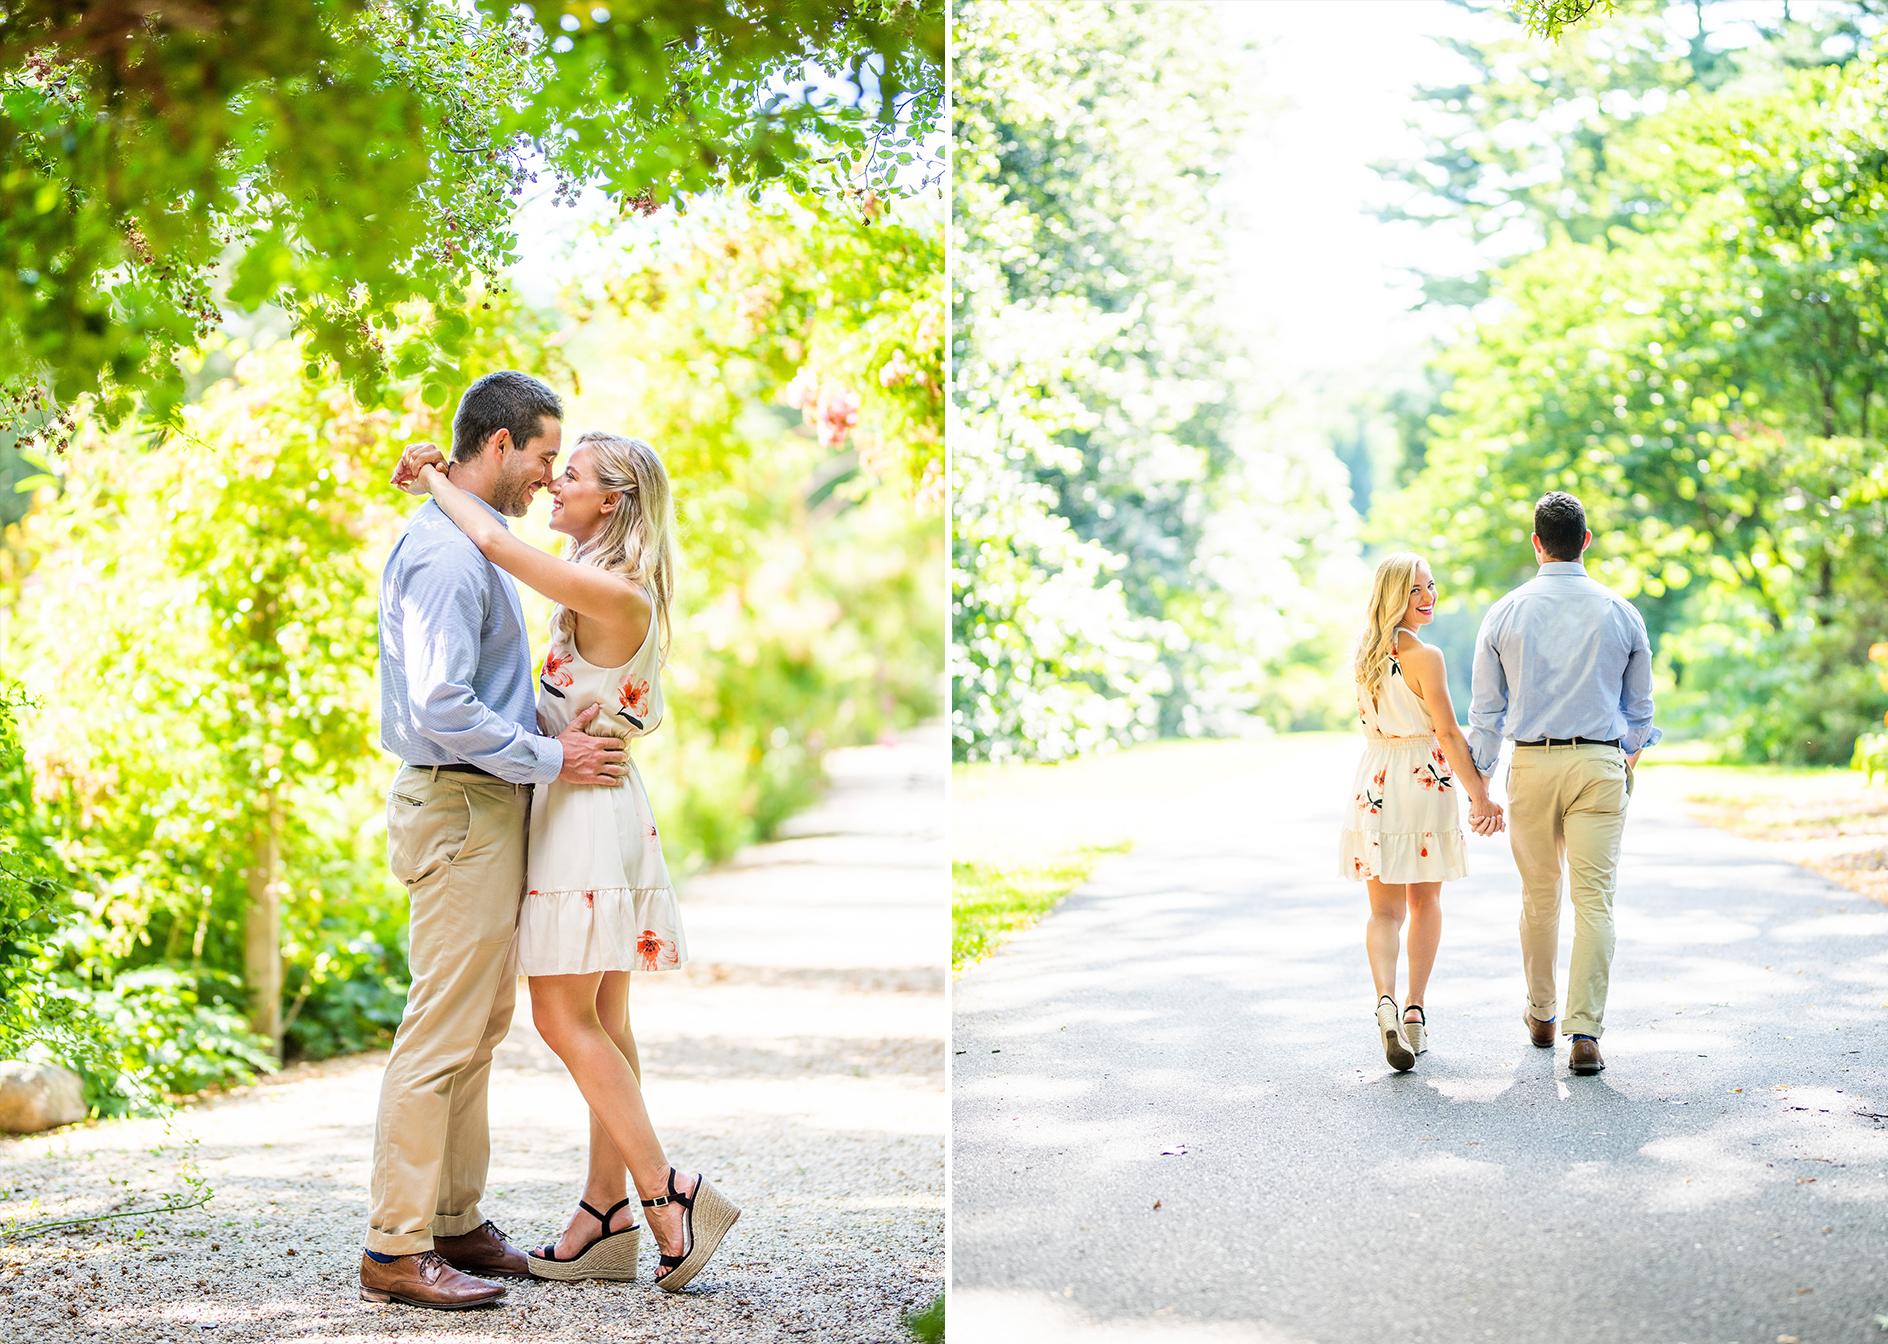 Planting Fields Arboretum Engagement Shoot | Oyster Bay Engagement Shoot | Long Island Wedding Photographer8